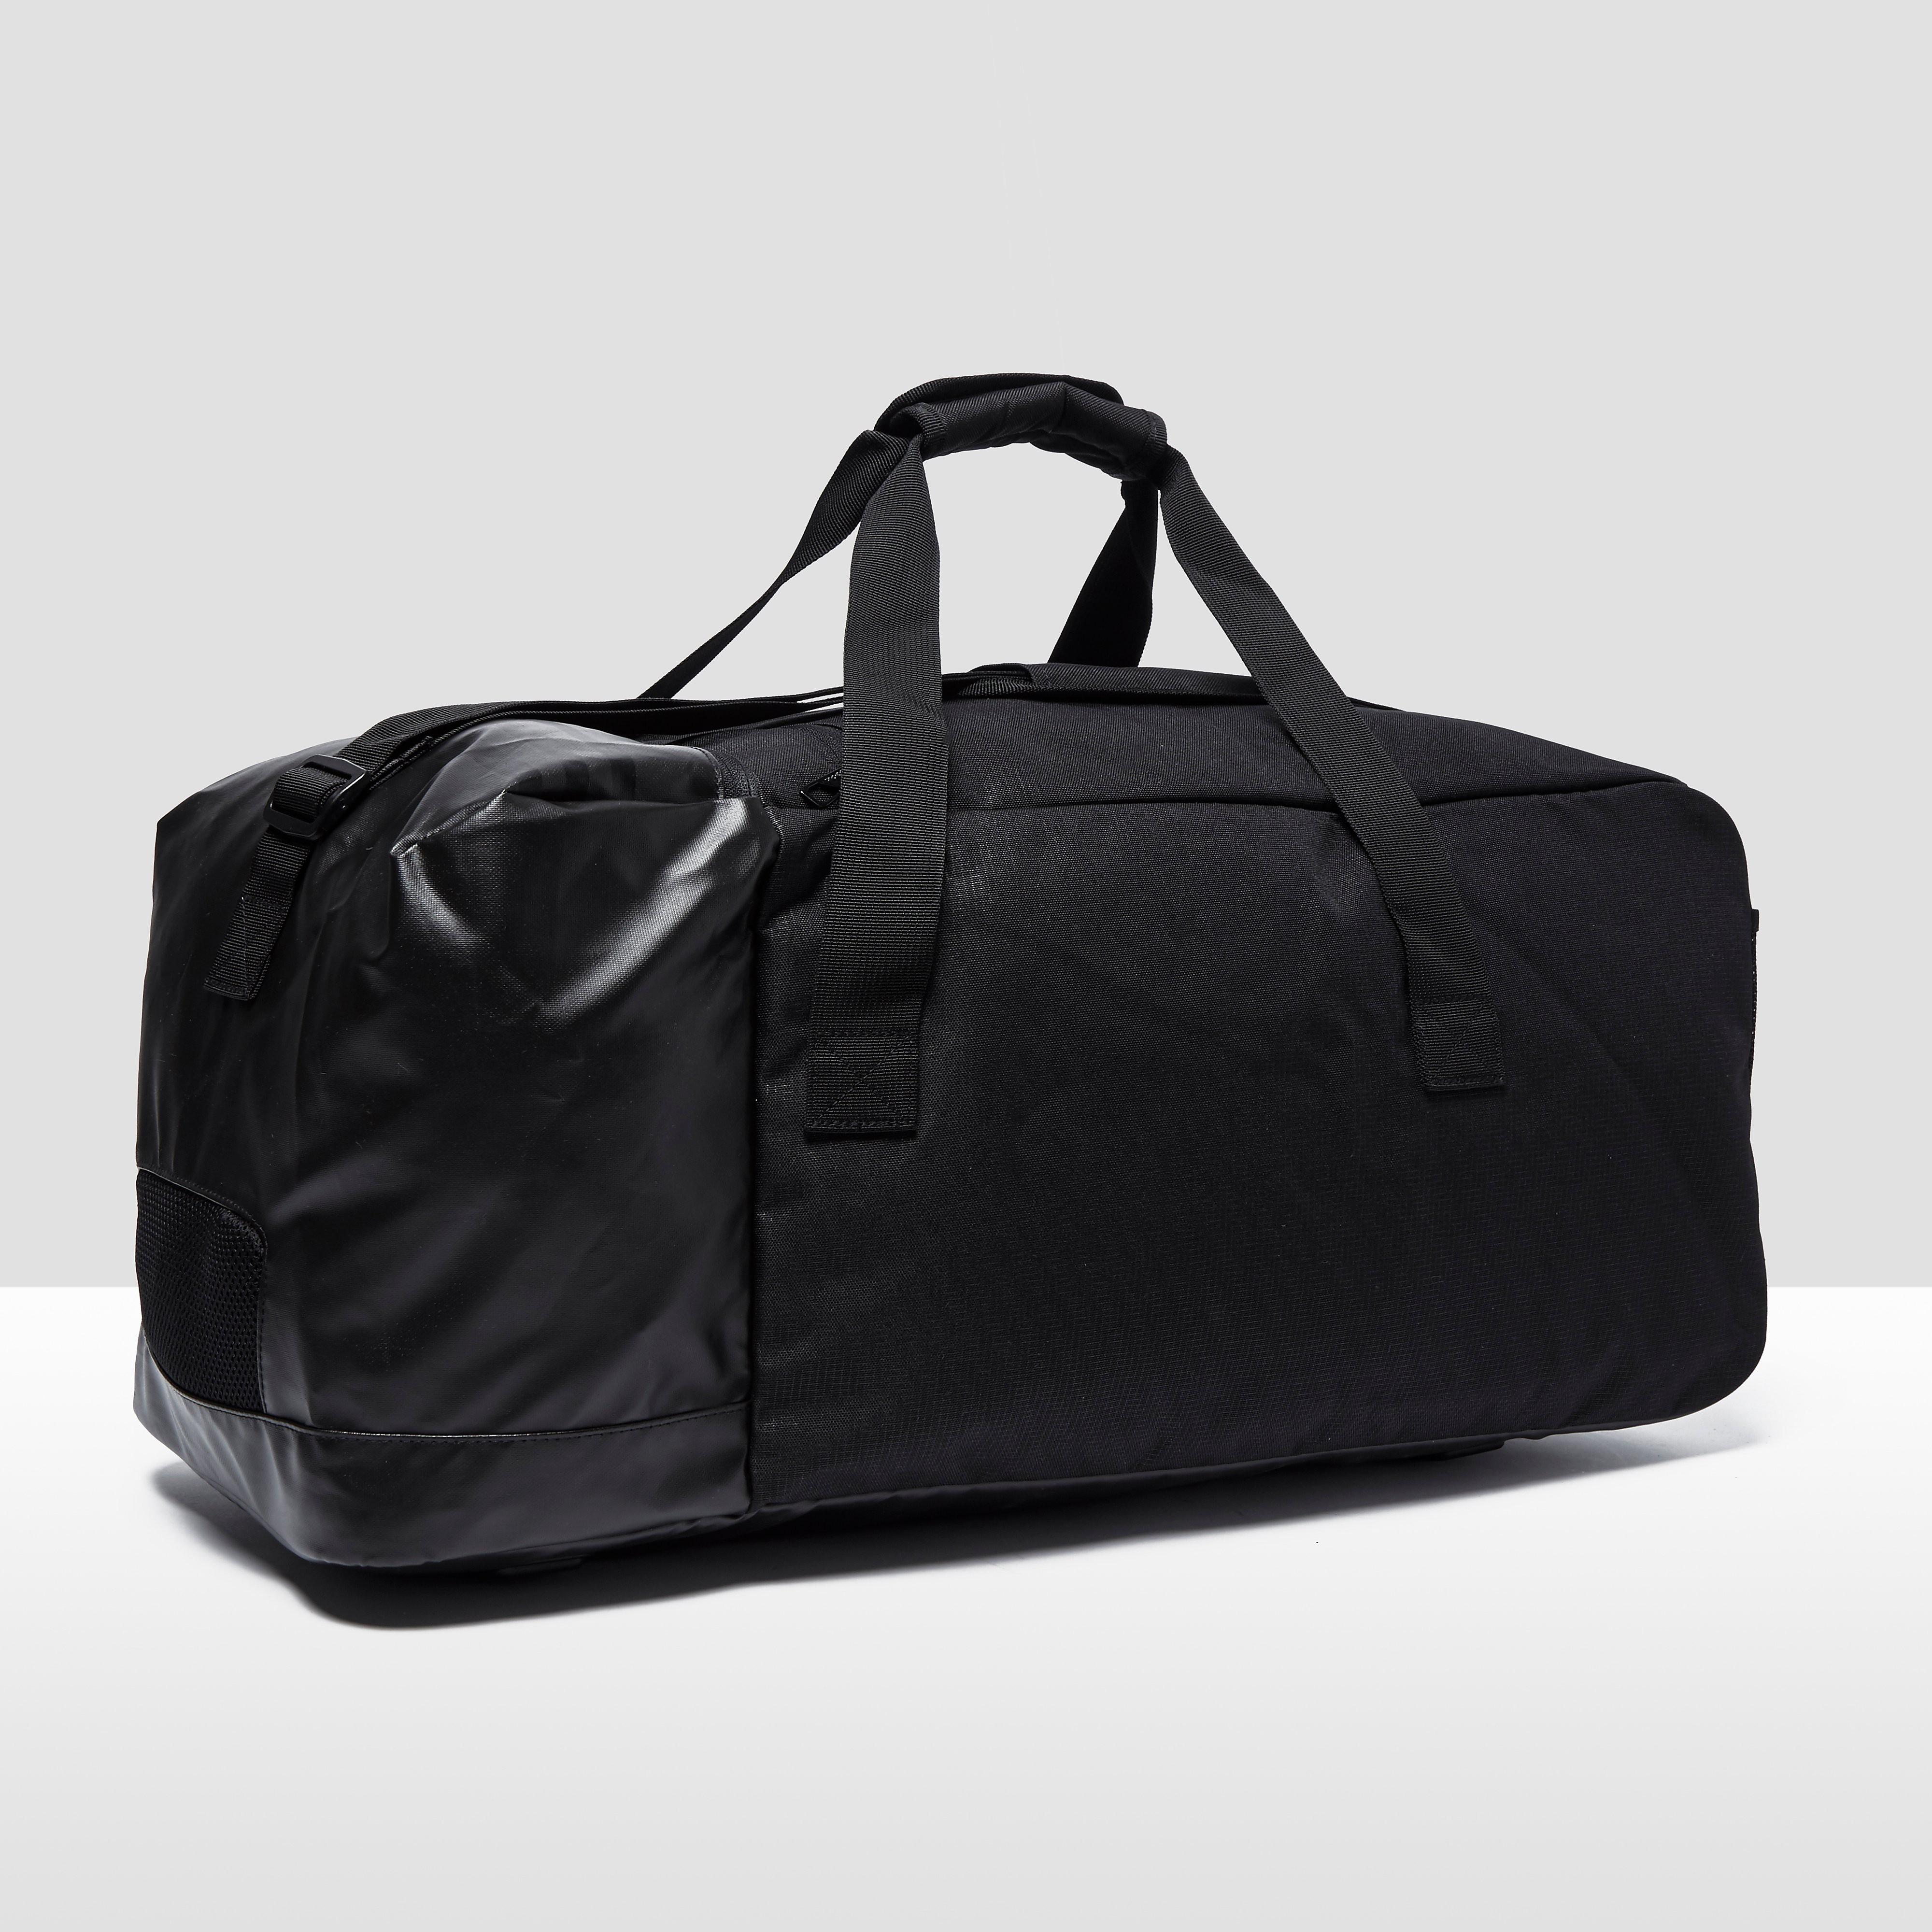 adidas 3-stripes performance team bag medium